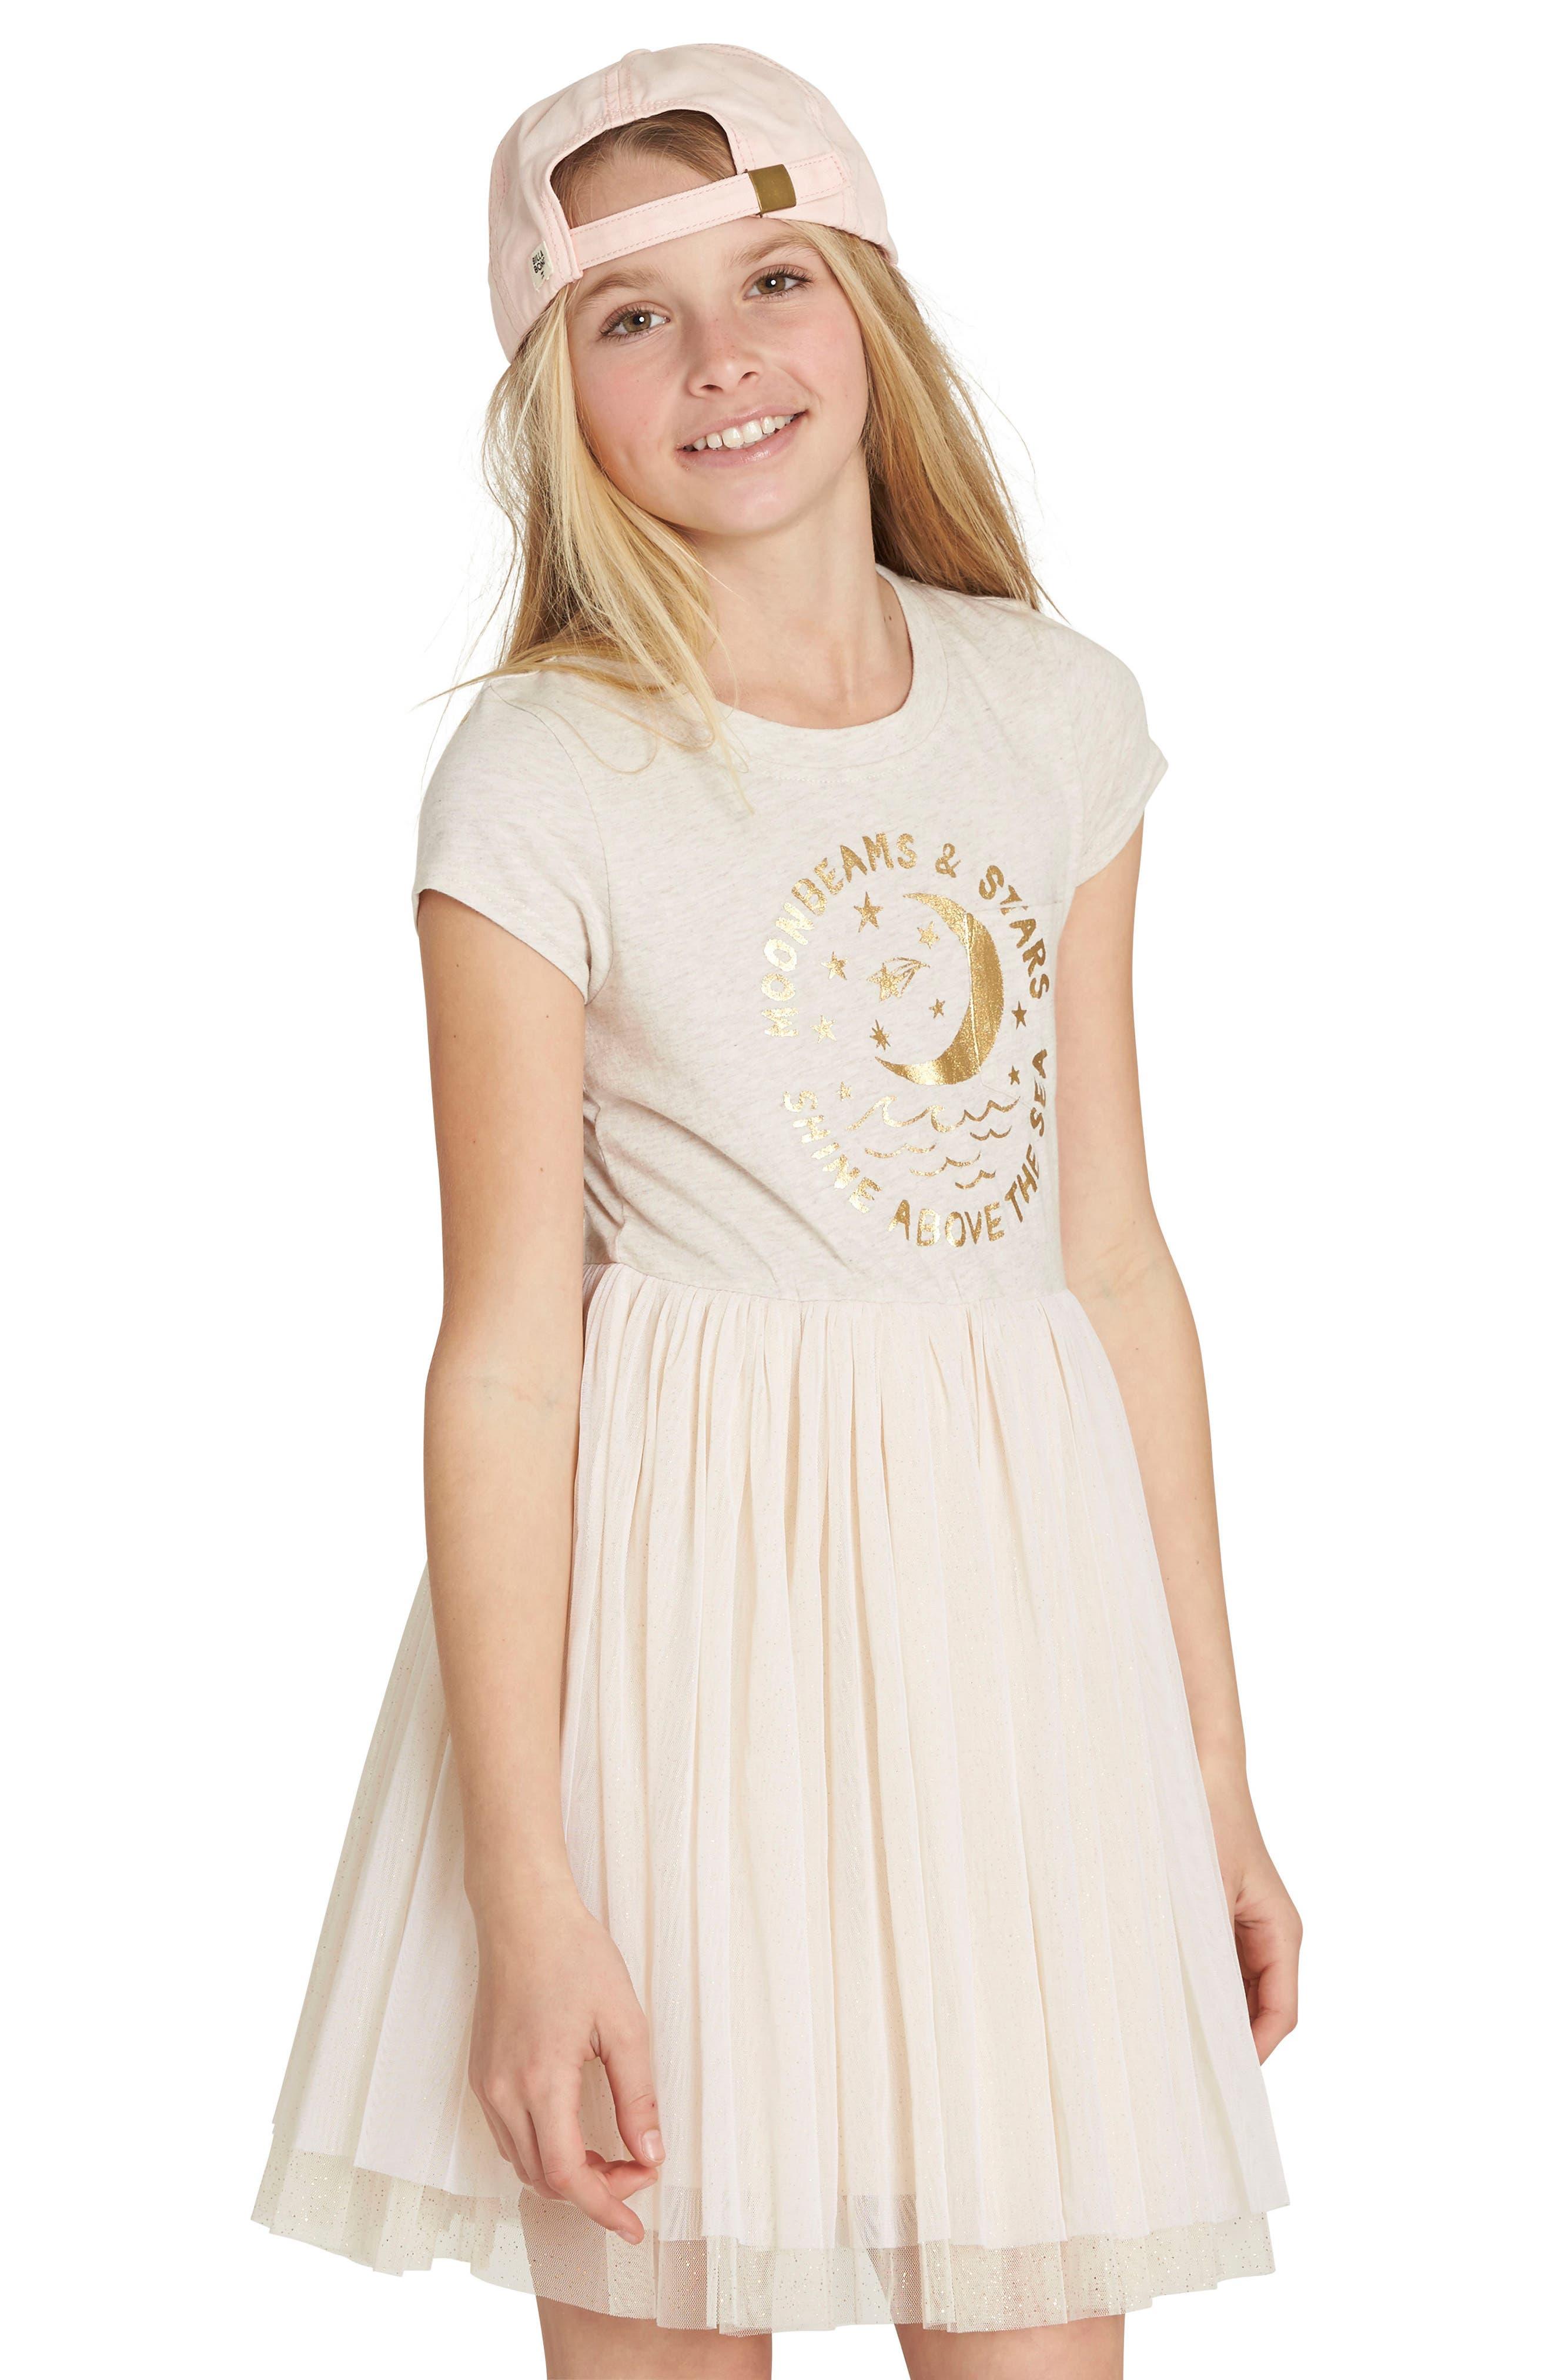 Main Image - Billabong Sunkissed Nights Mixed Media Dress (Little Girls & Big Girls)